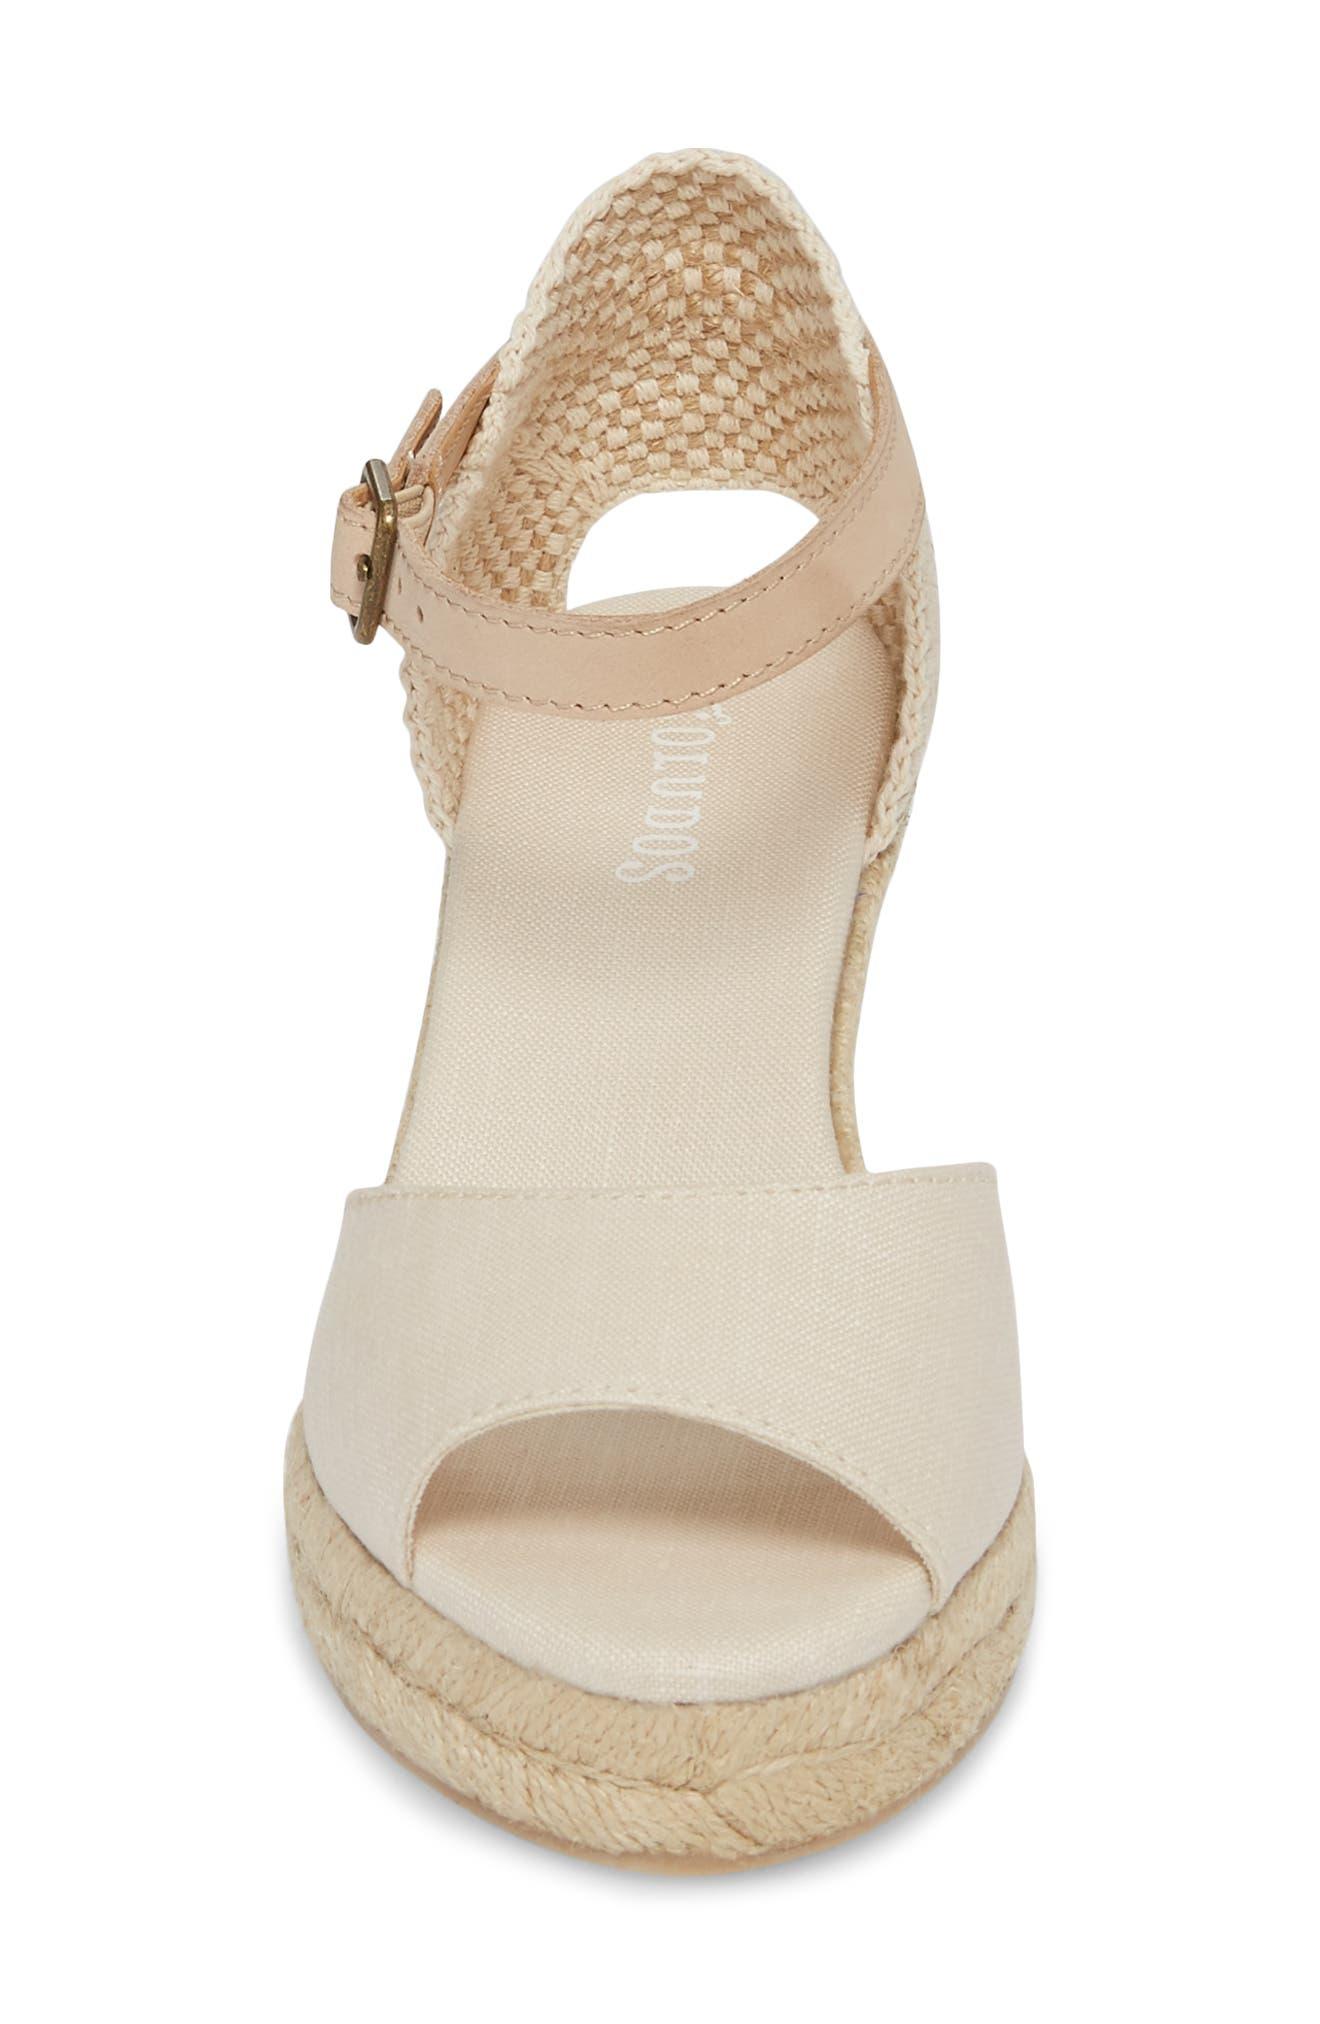 Espadrille Wedge Sandal,                             Alternate thumbnail 4, color,                             Blush Fabric